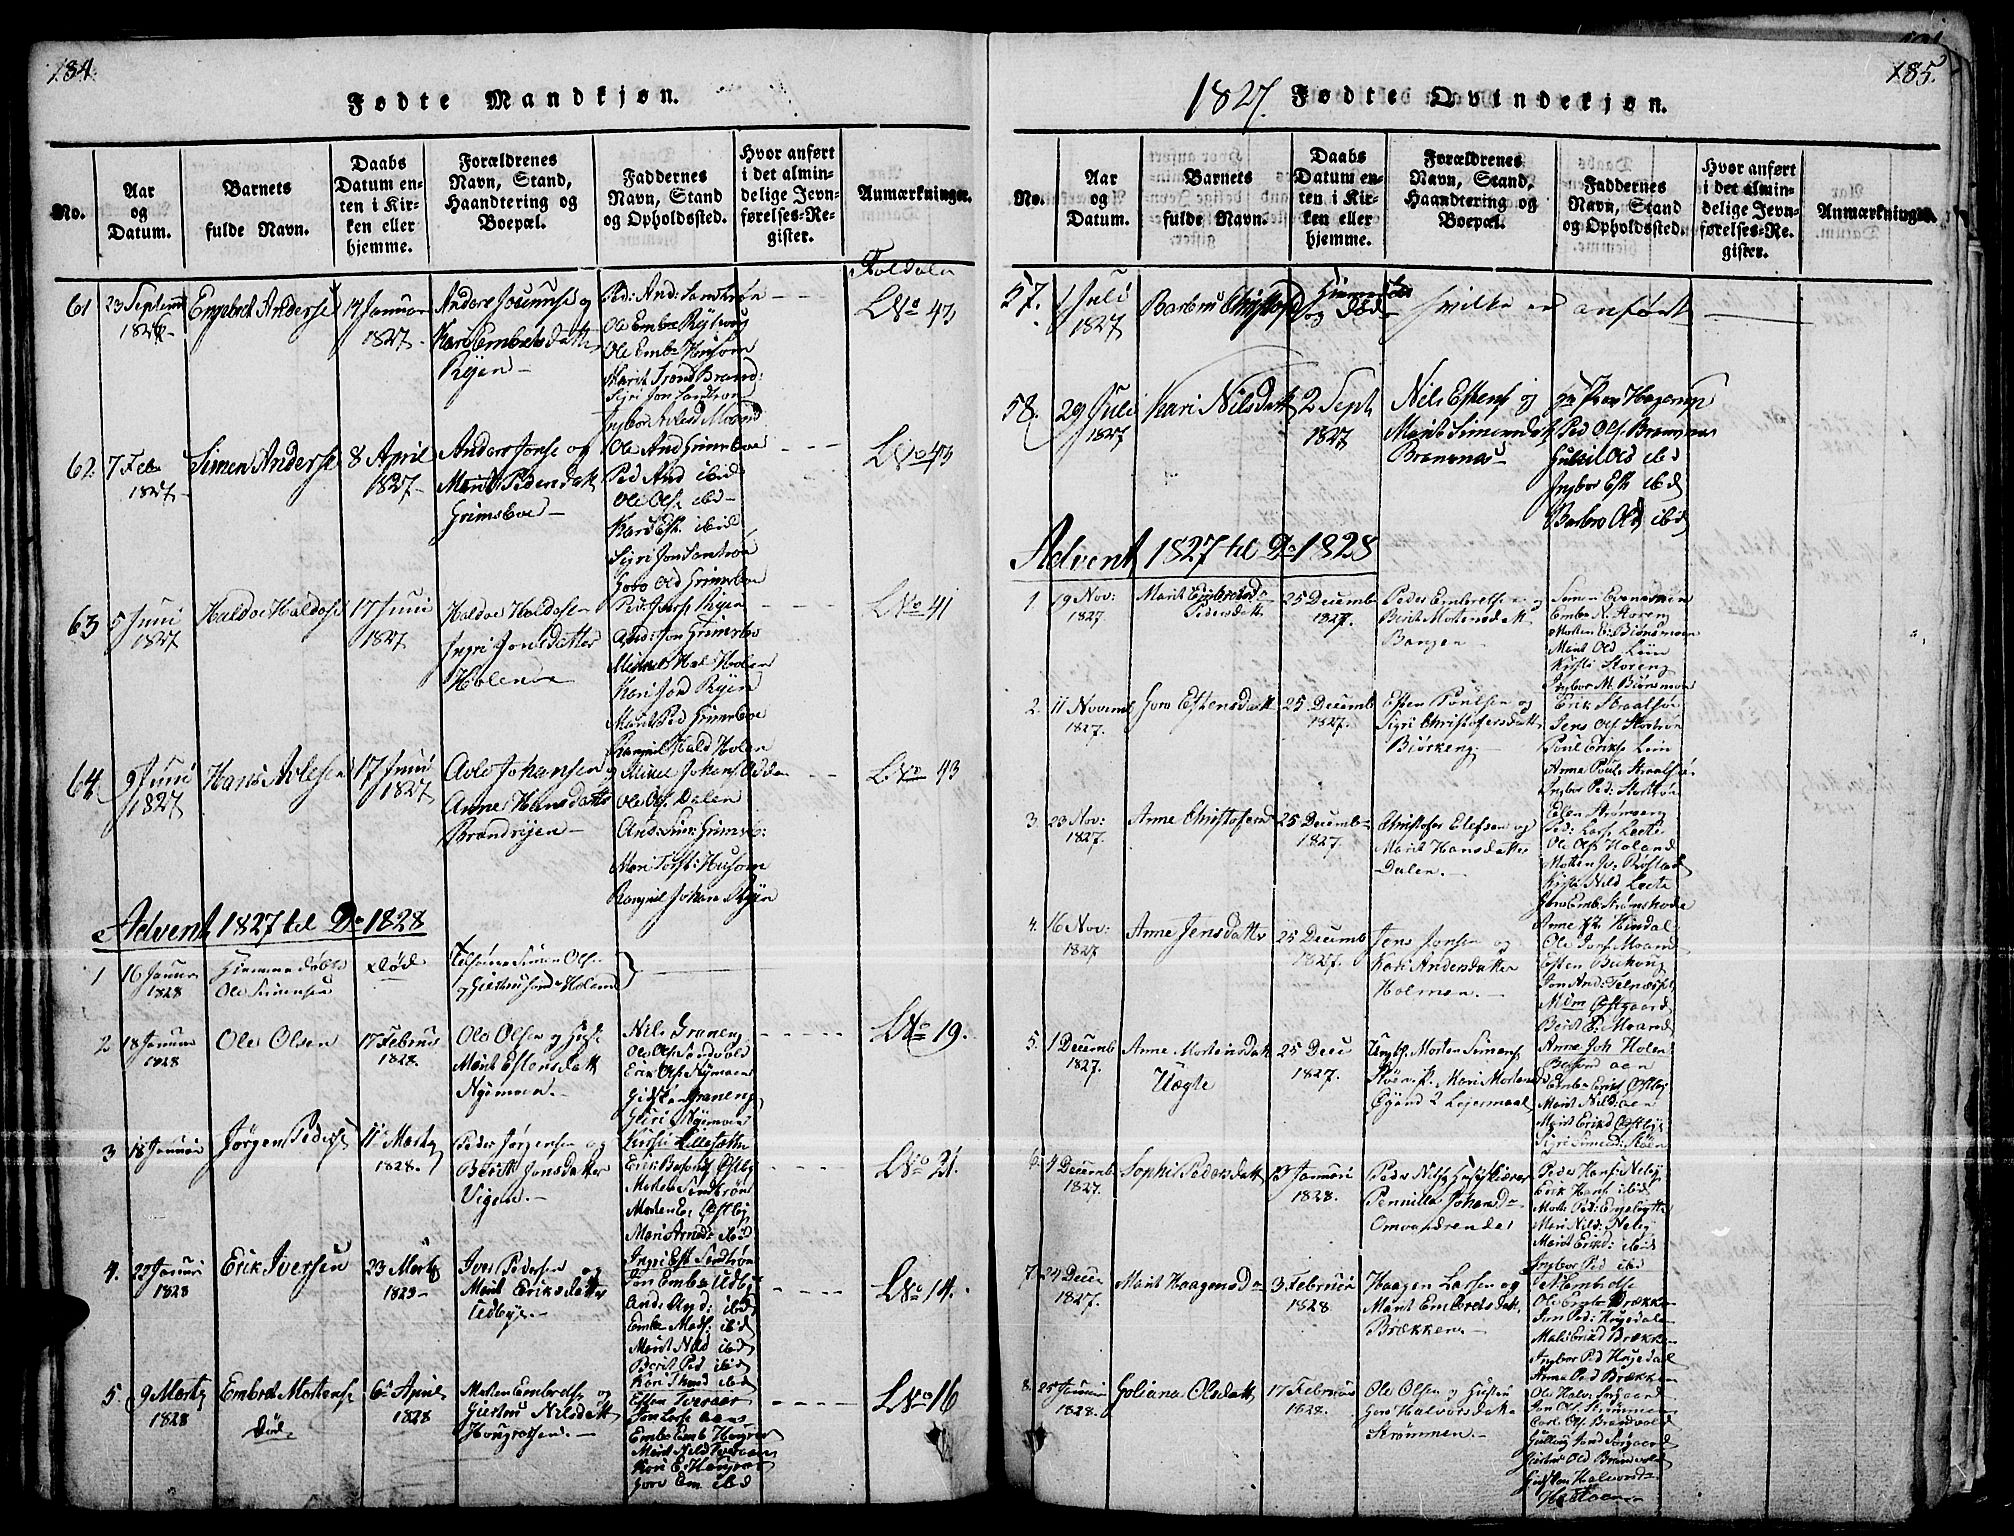 SAH, Tynset prestekontor, Ministerialbok nr. 18, 1815-1829, s. 184-185